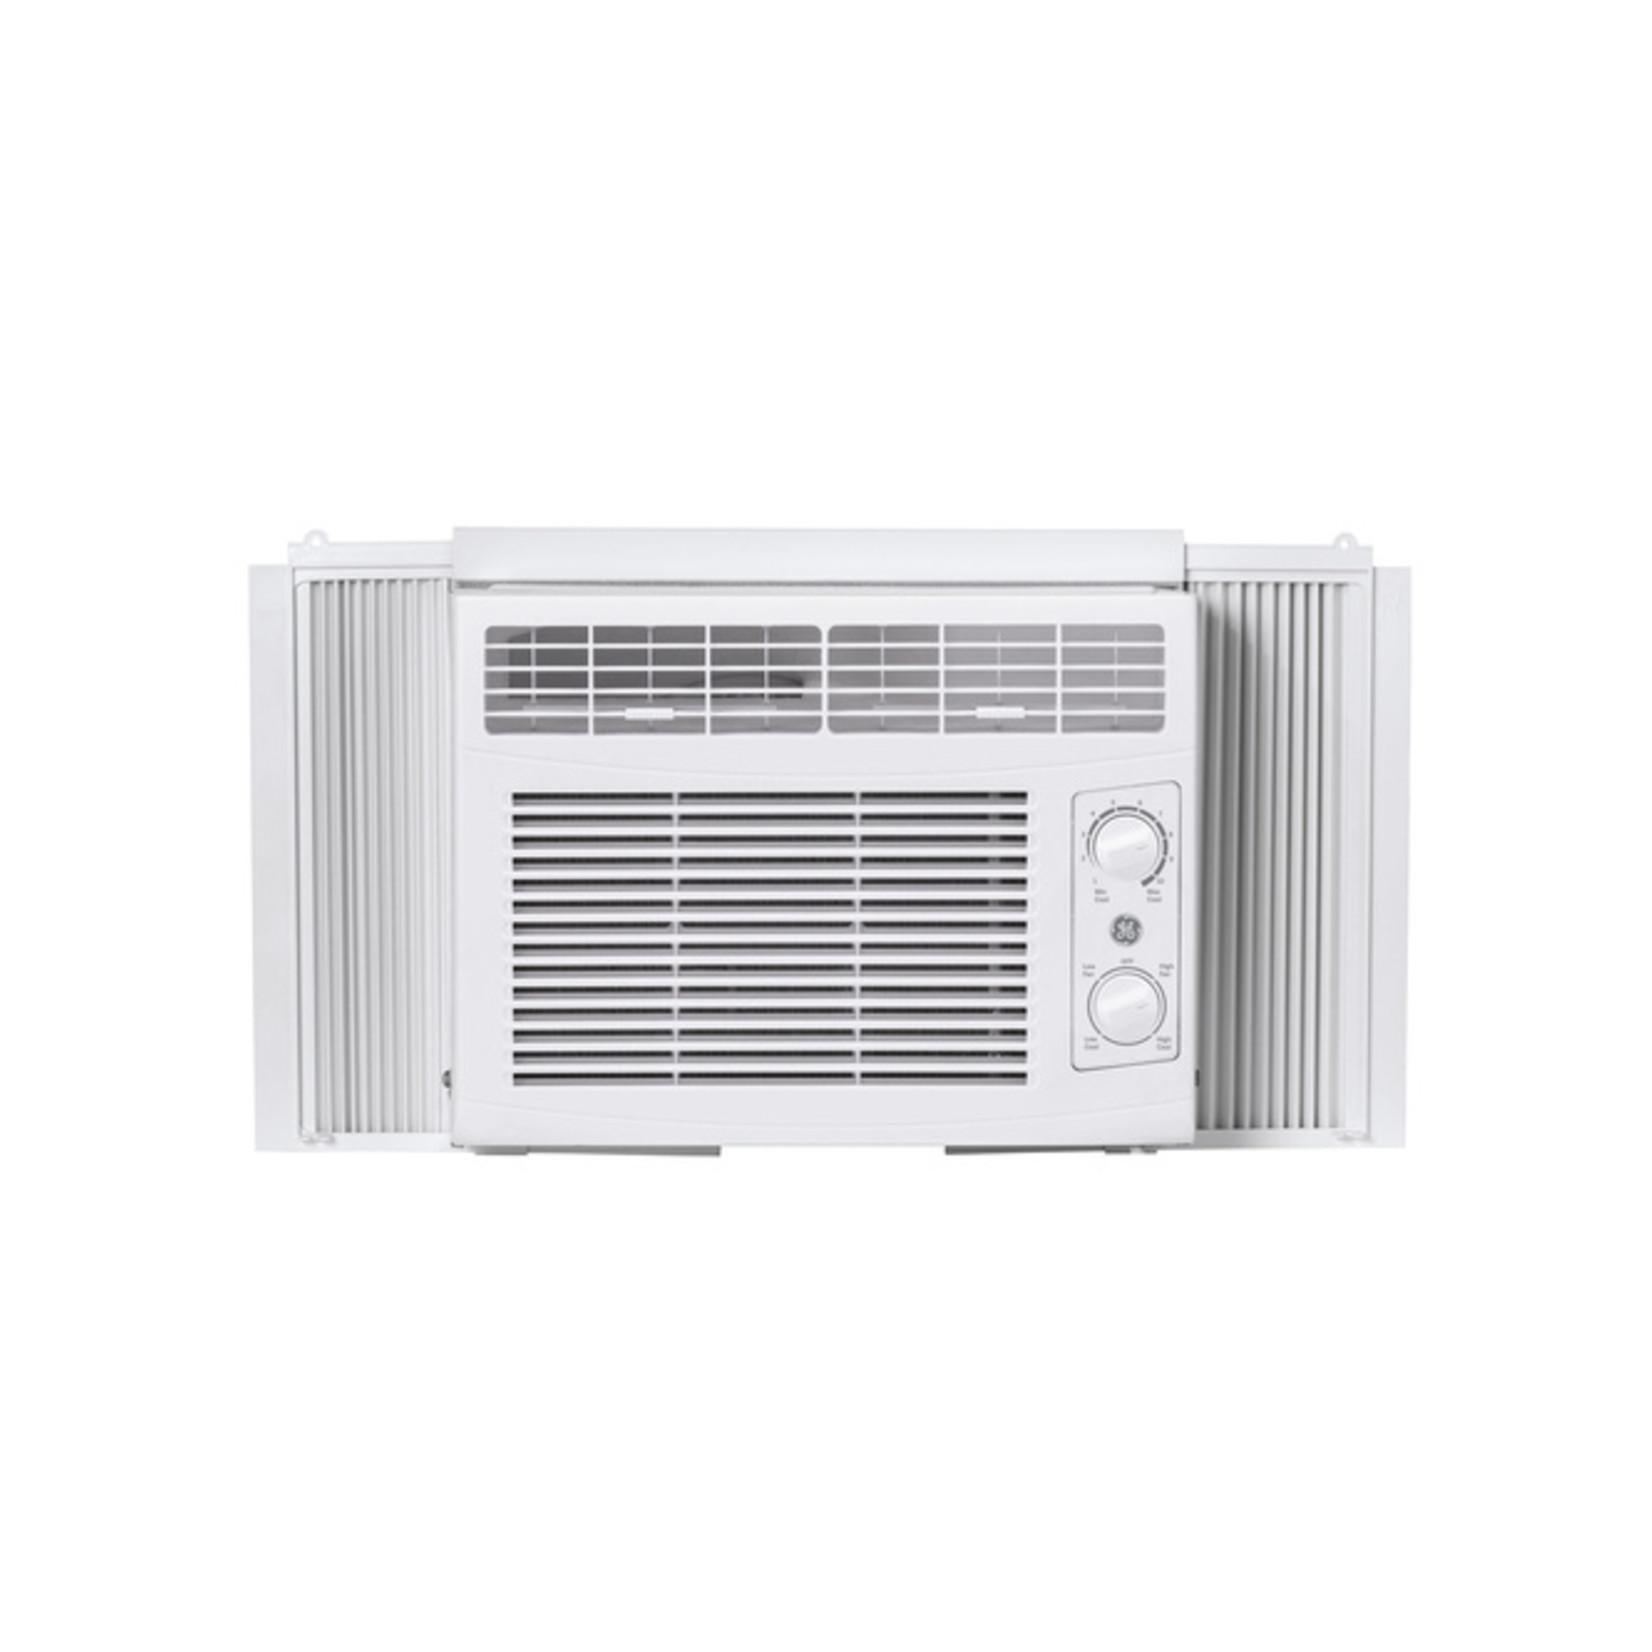 *5050 BTU GE Window Air Conditioner - Slight Damage on Bracket